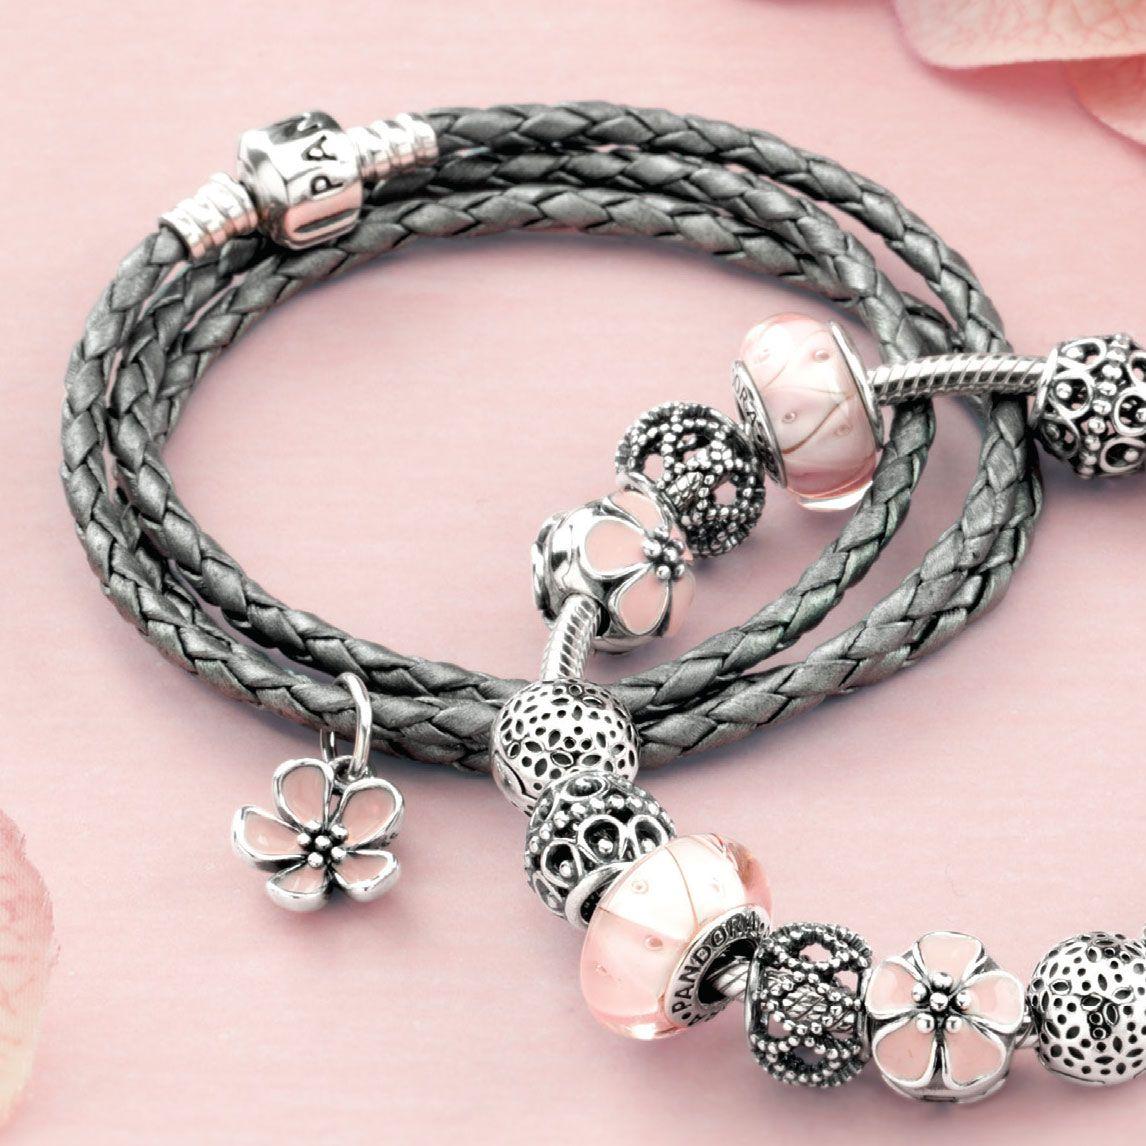 Pandora Pandora Jewelry: Pandora Cherry Blossom With Pink Enamel Stories Pendant